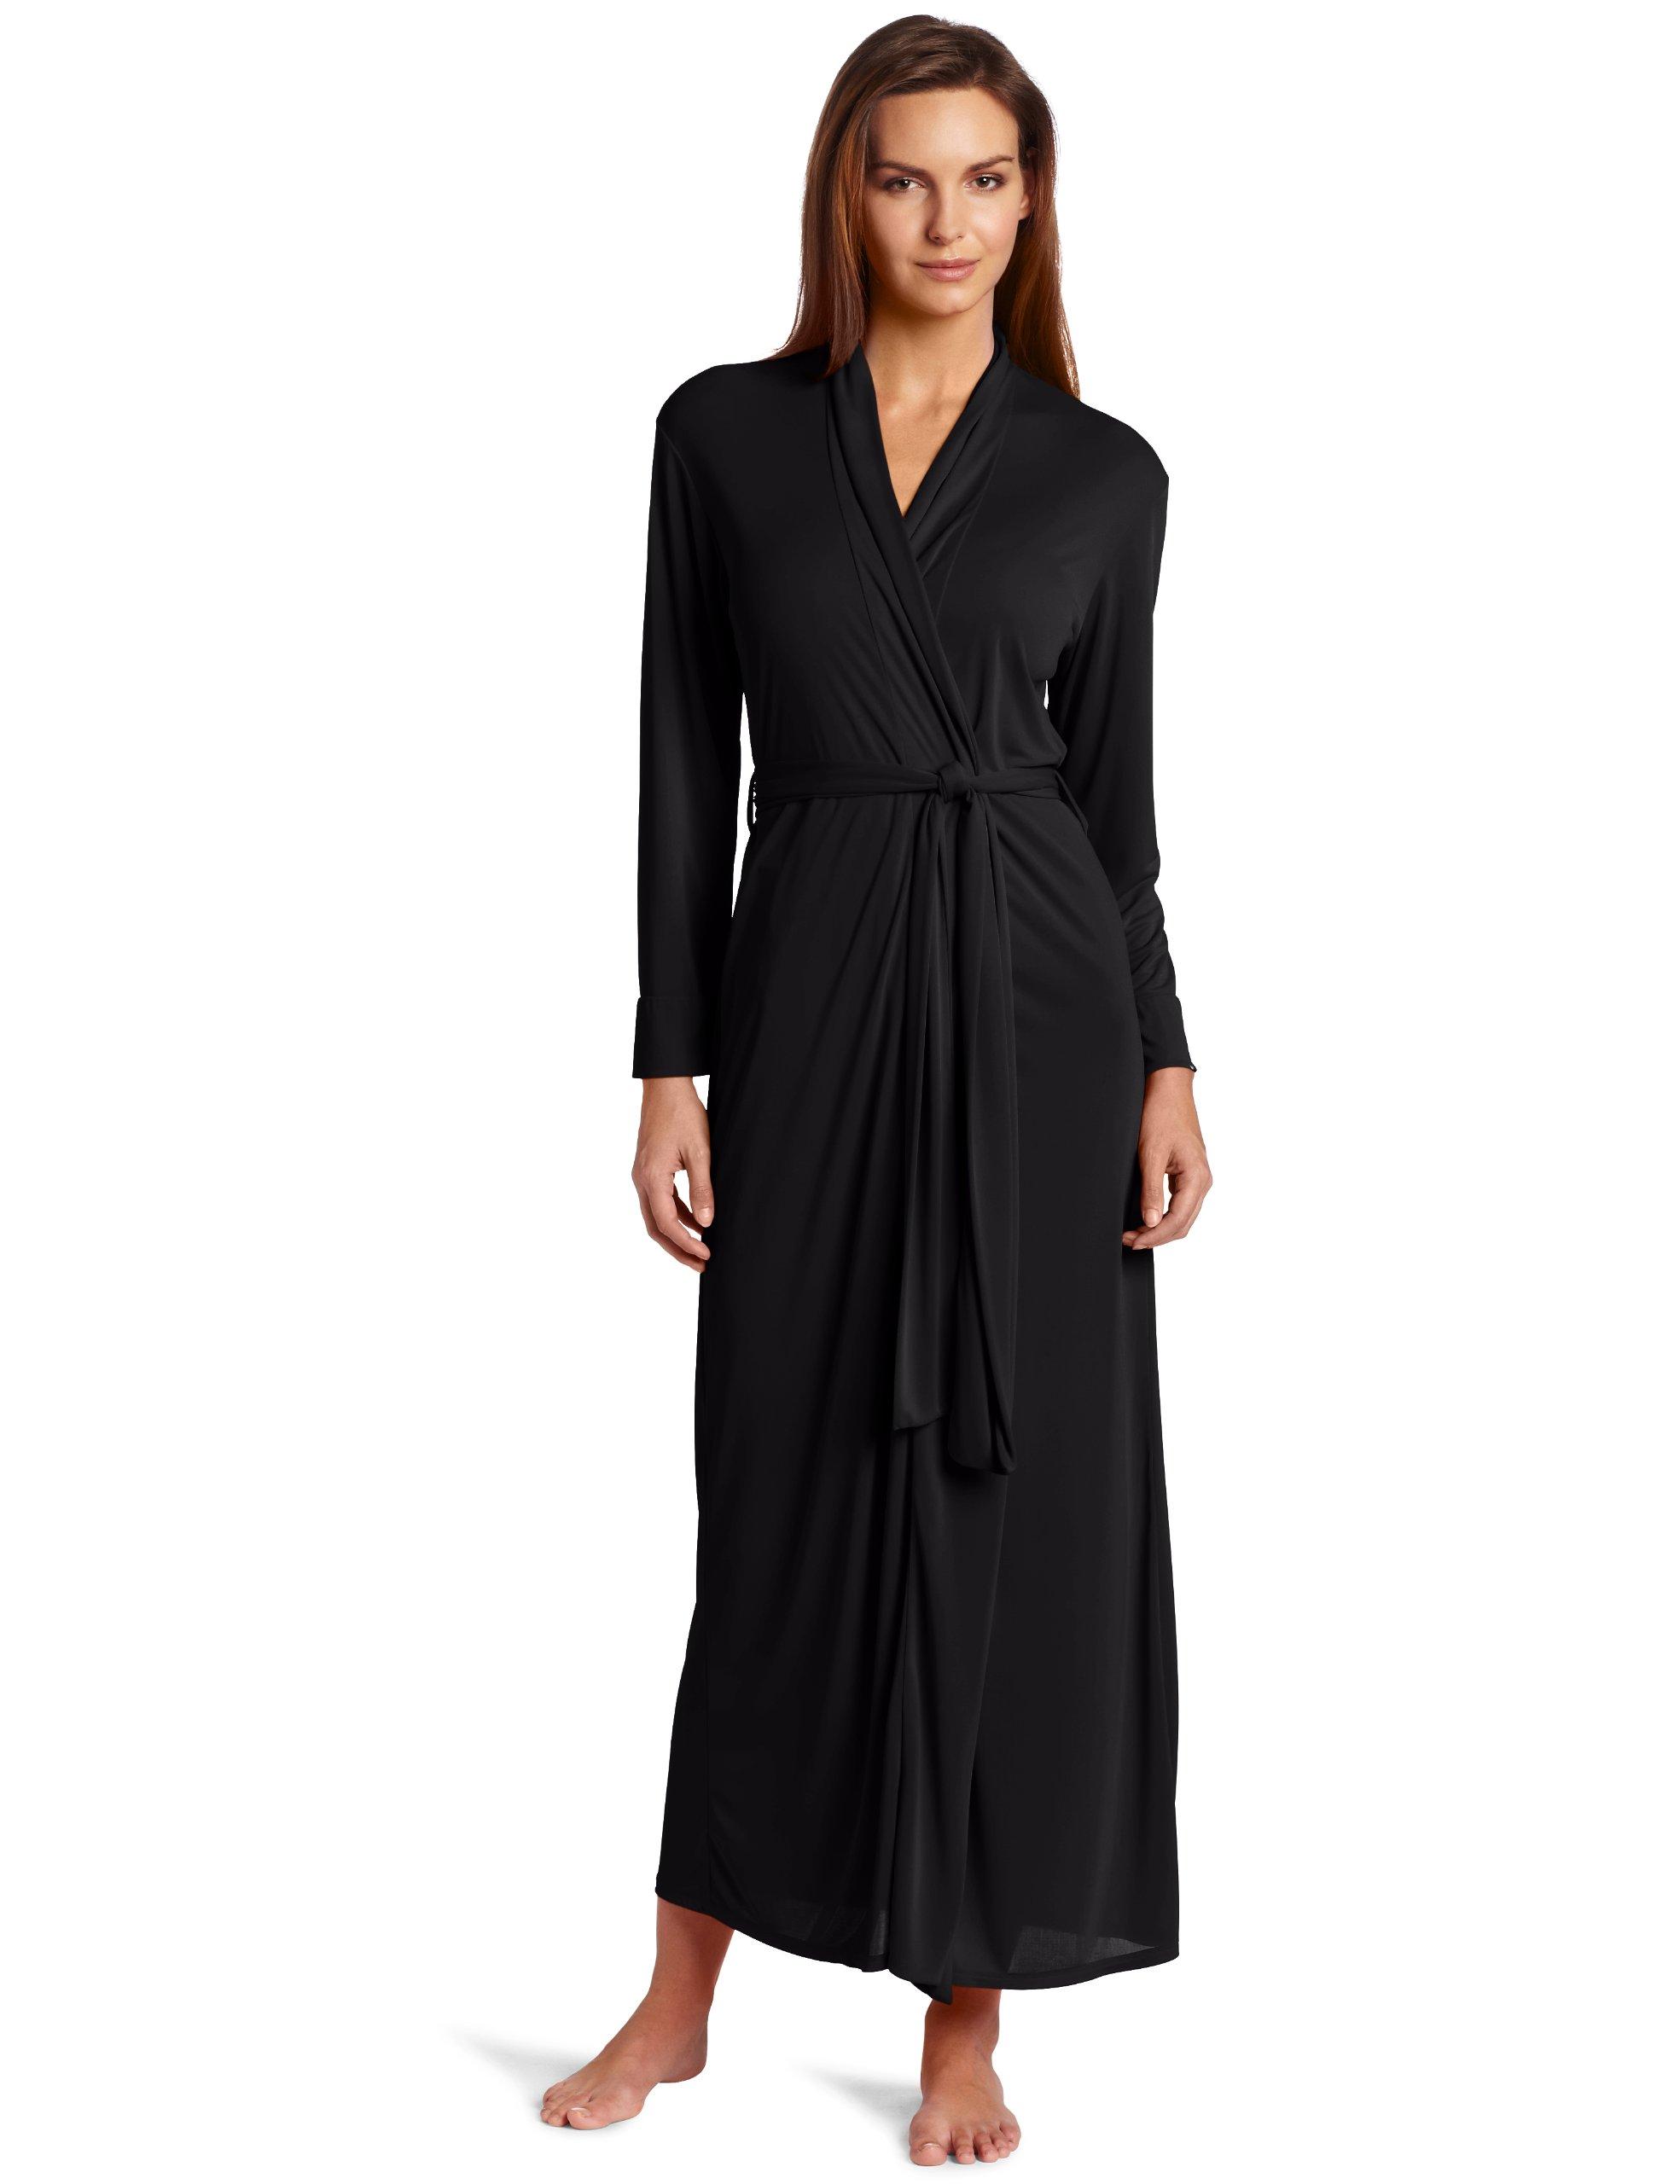 Natori Women's Aphrodite Robe, Black, Large